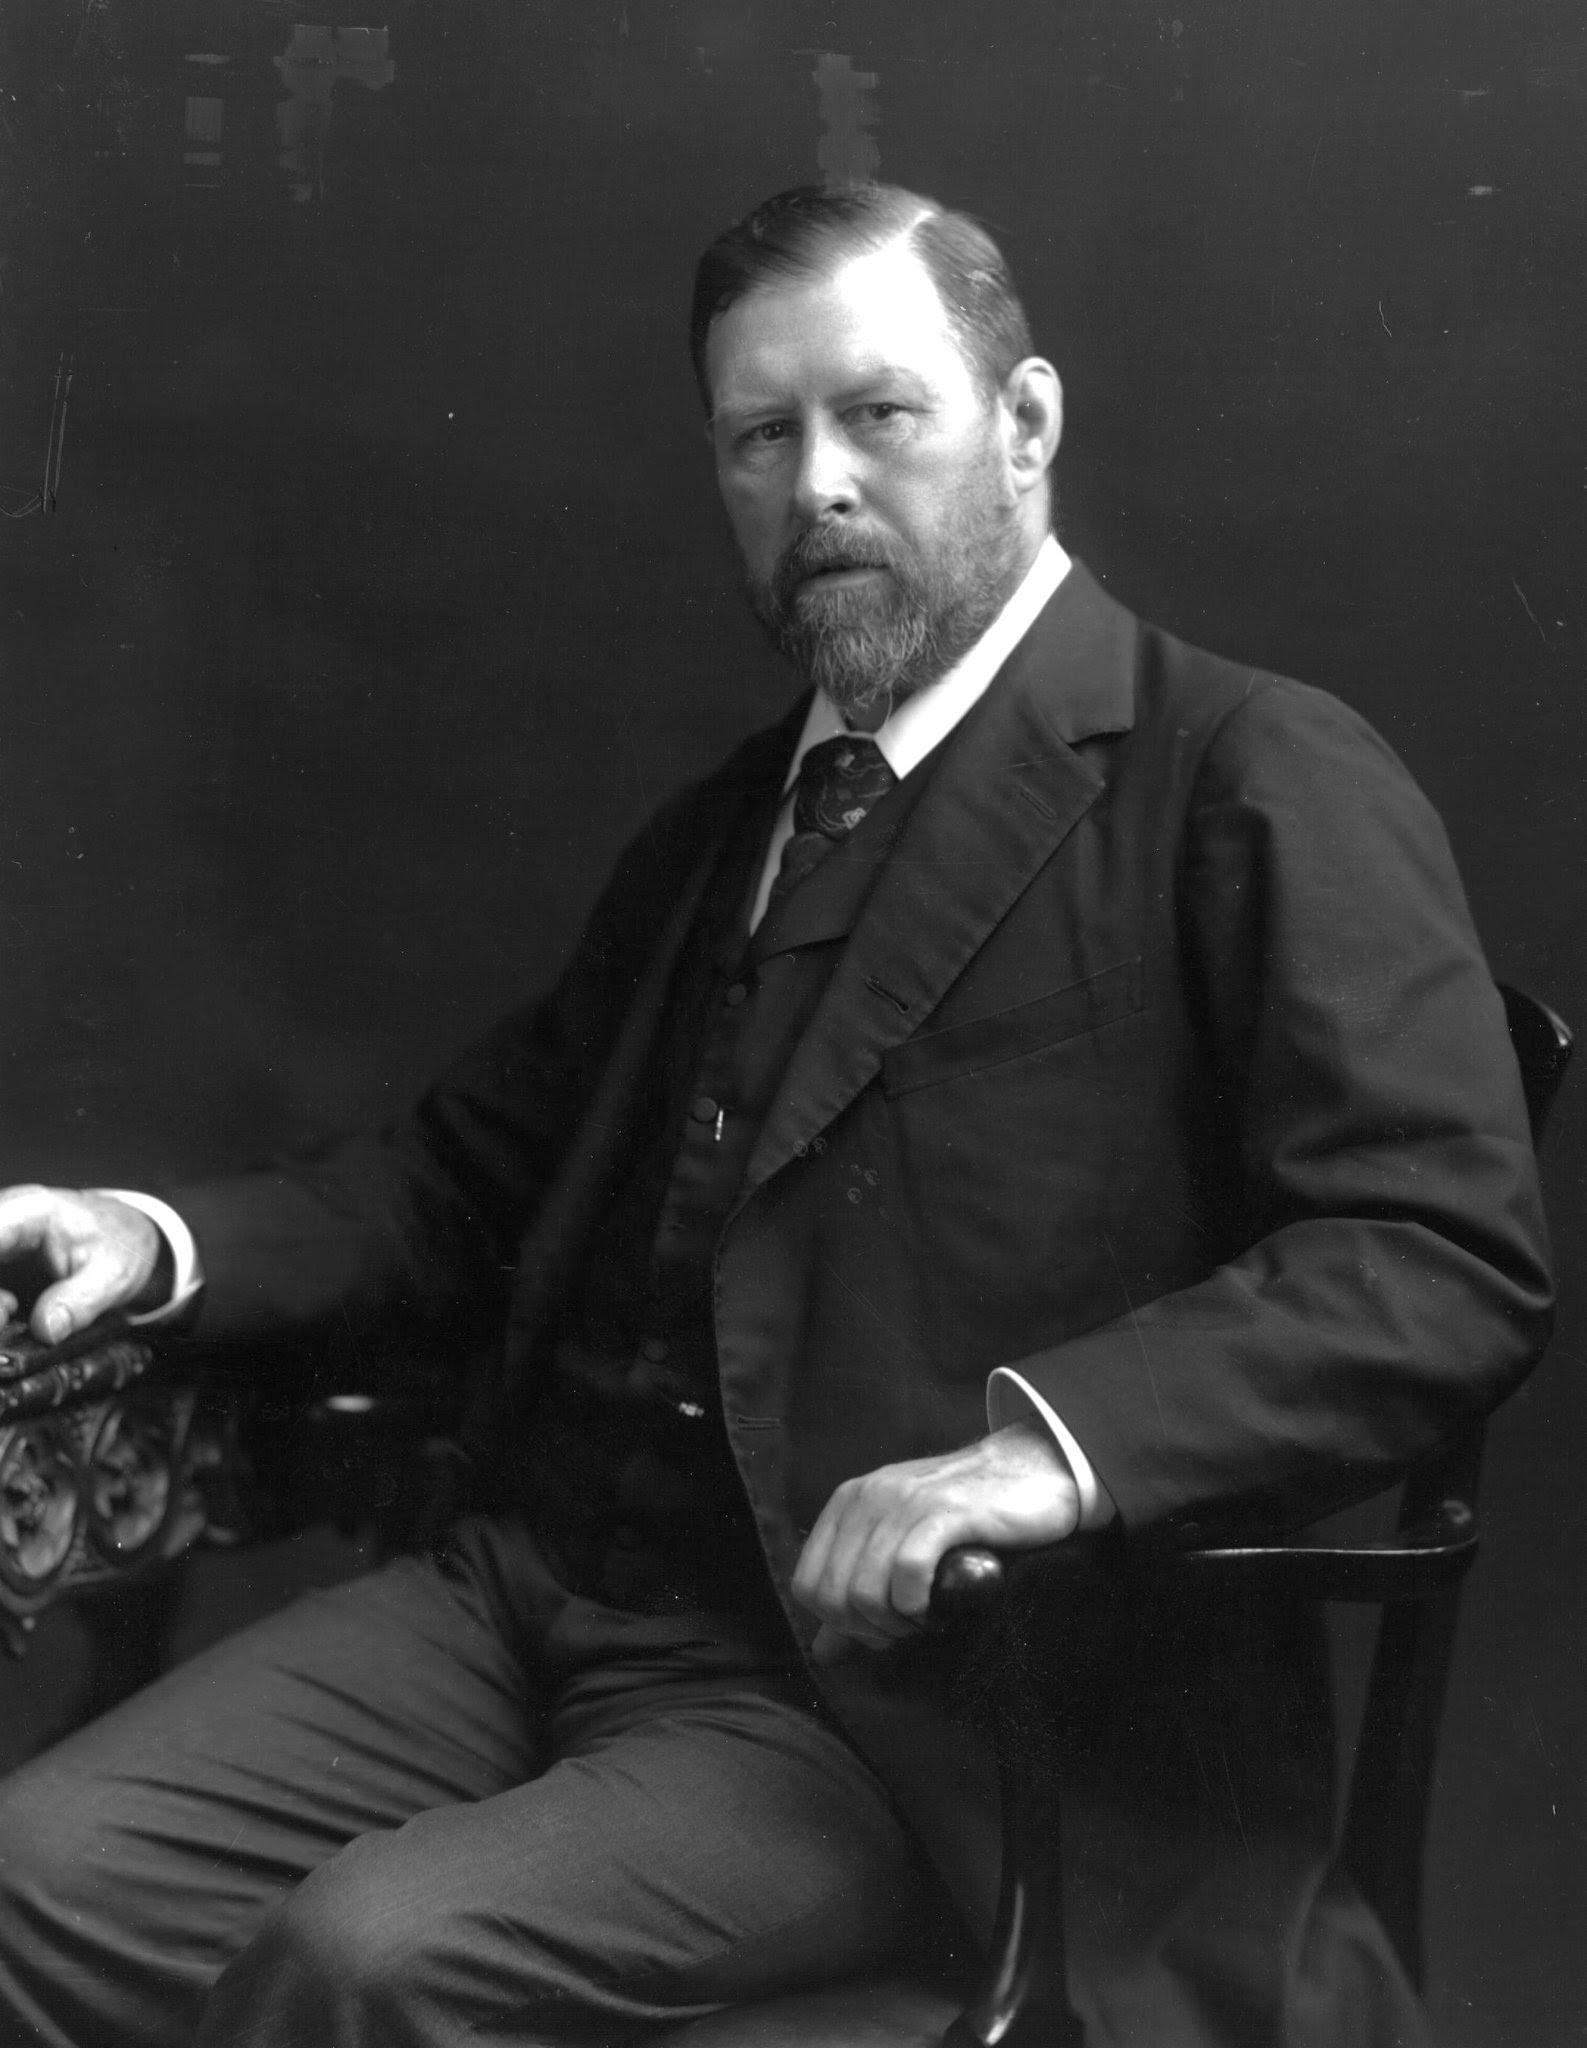 Fișier:Bram Stoker 1906.jpg